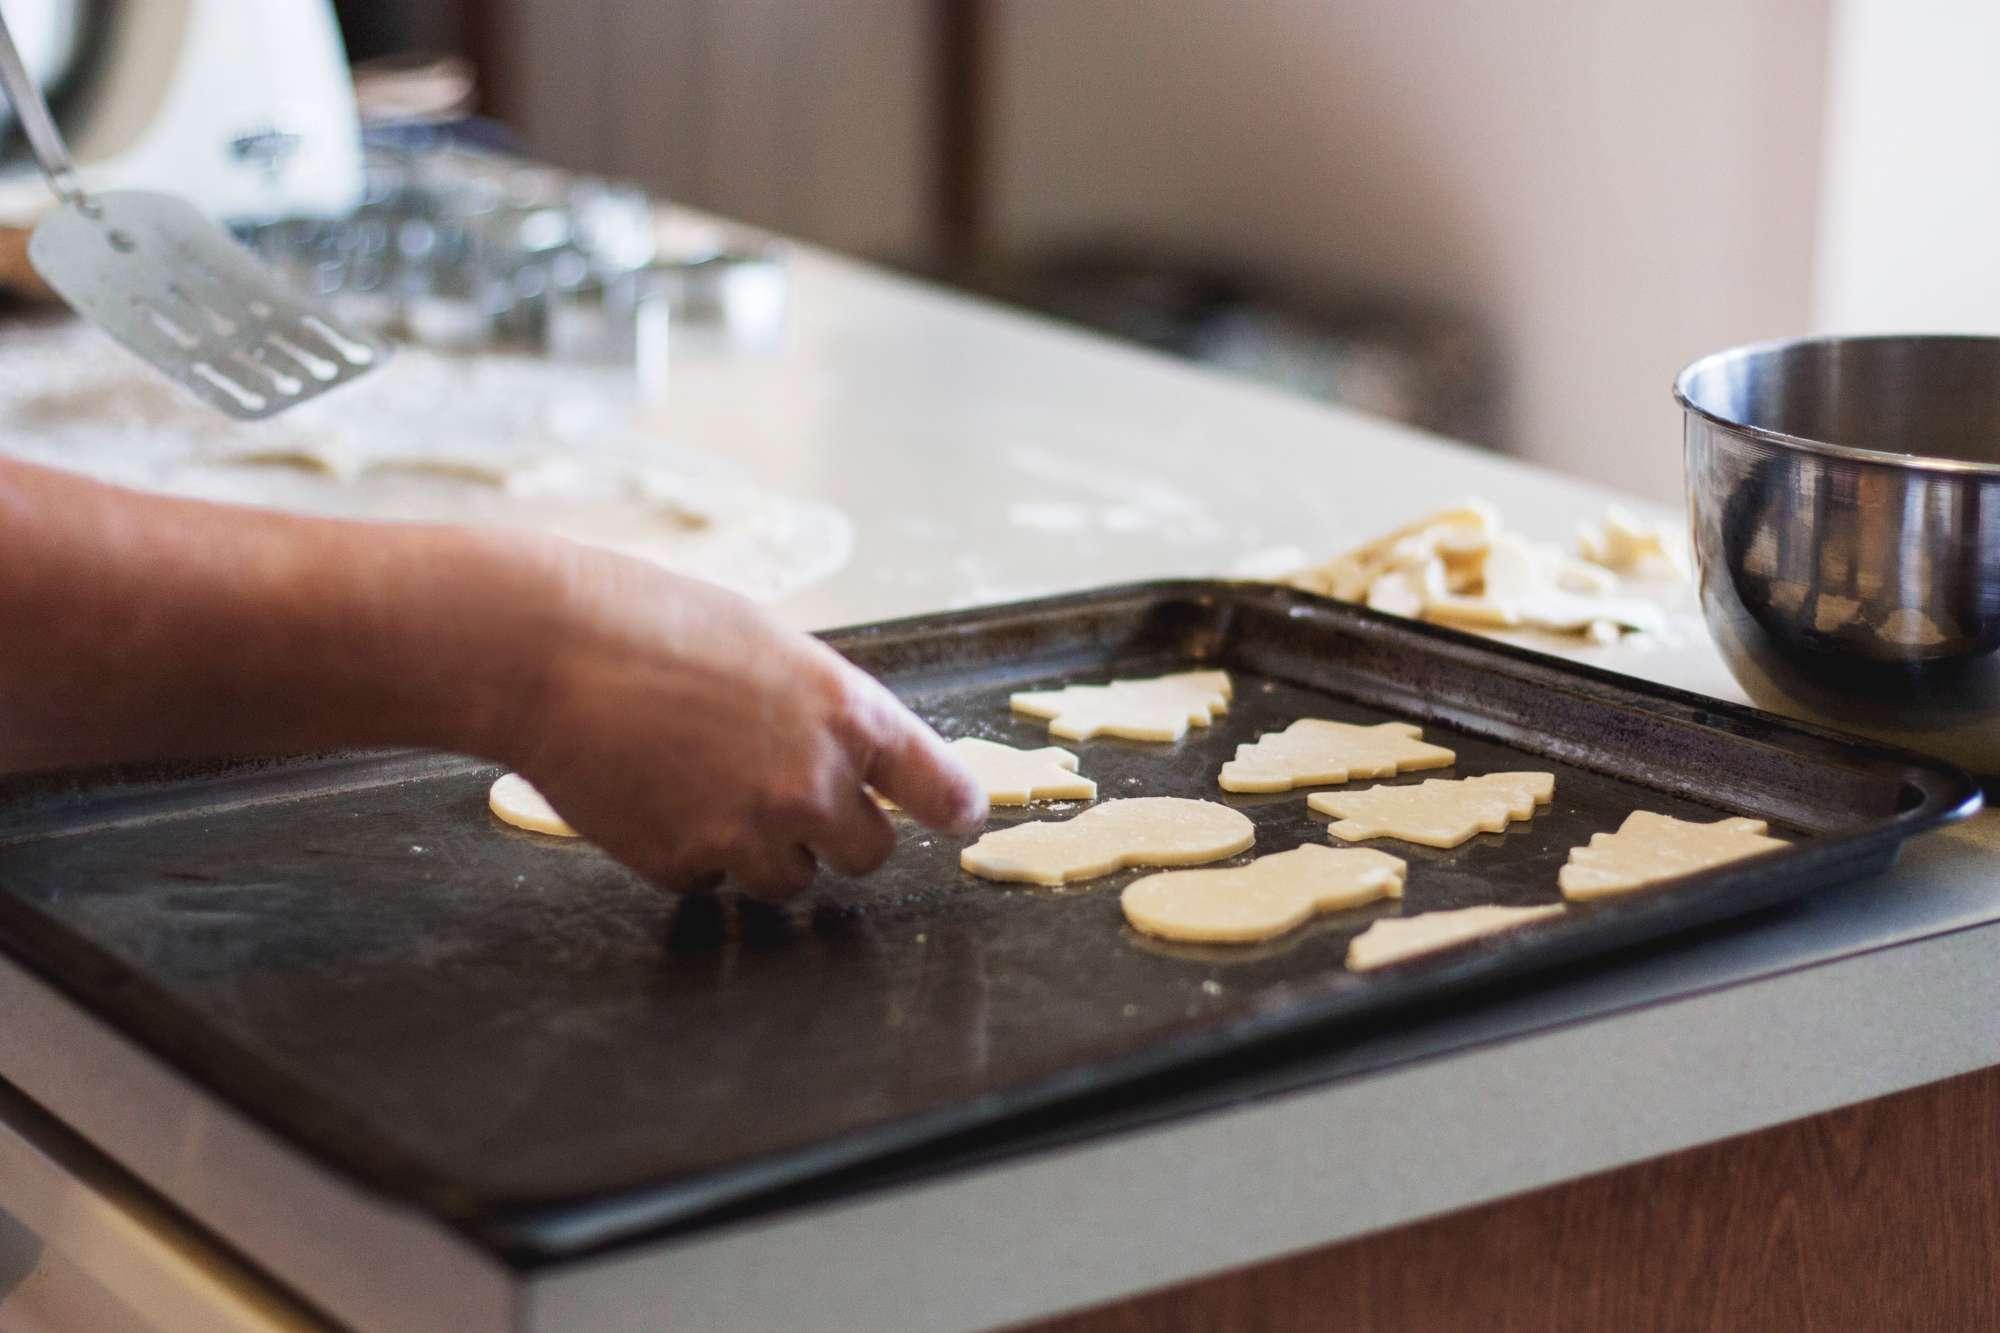 Holiday cookies baking